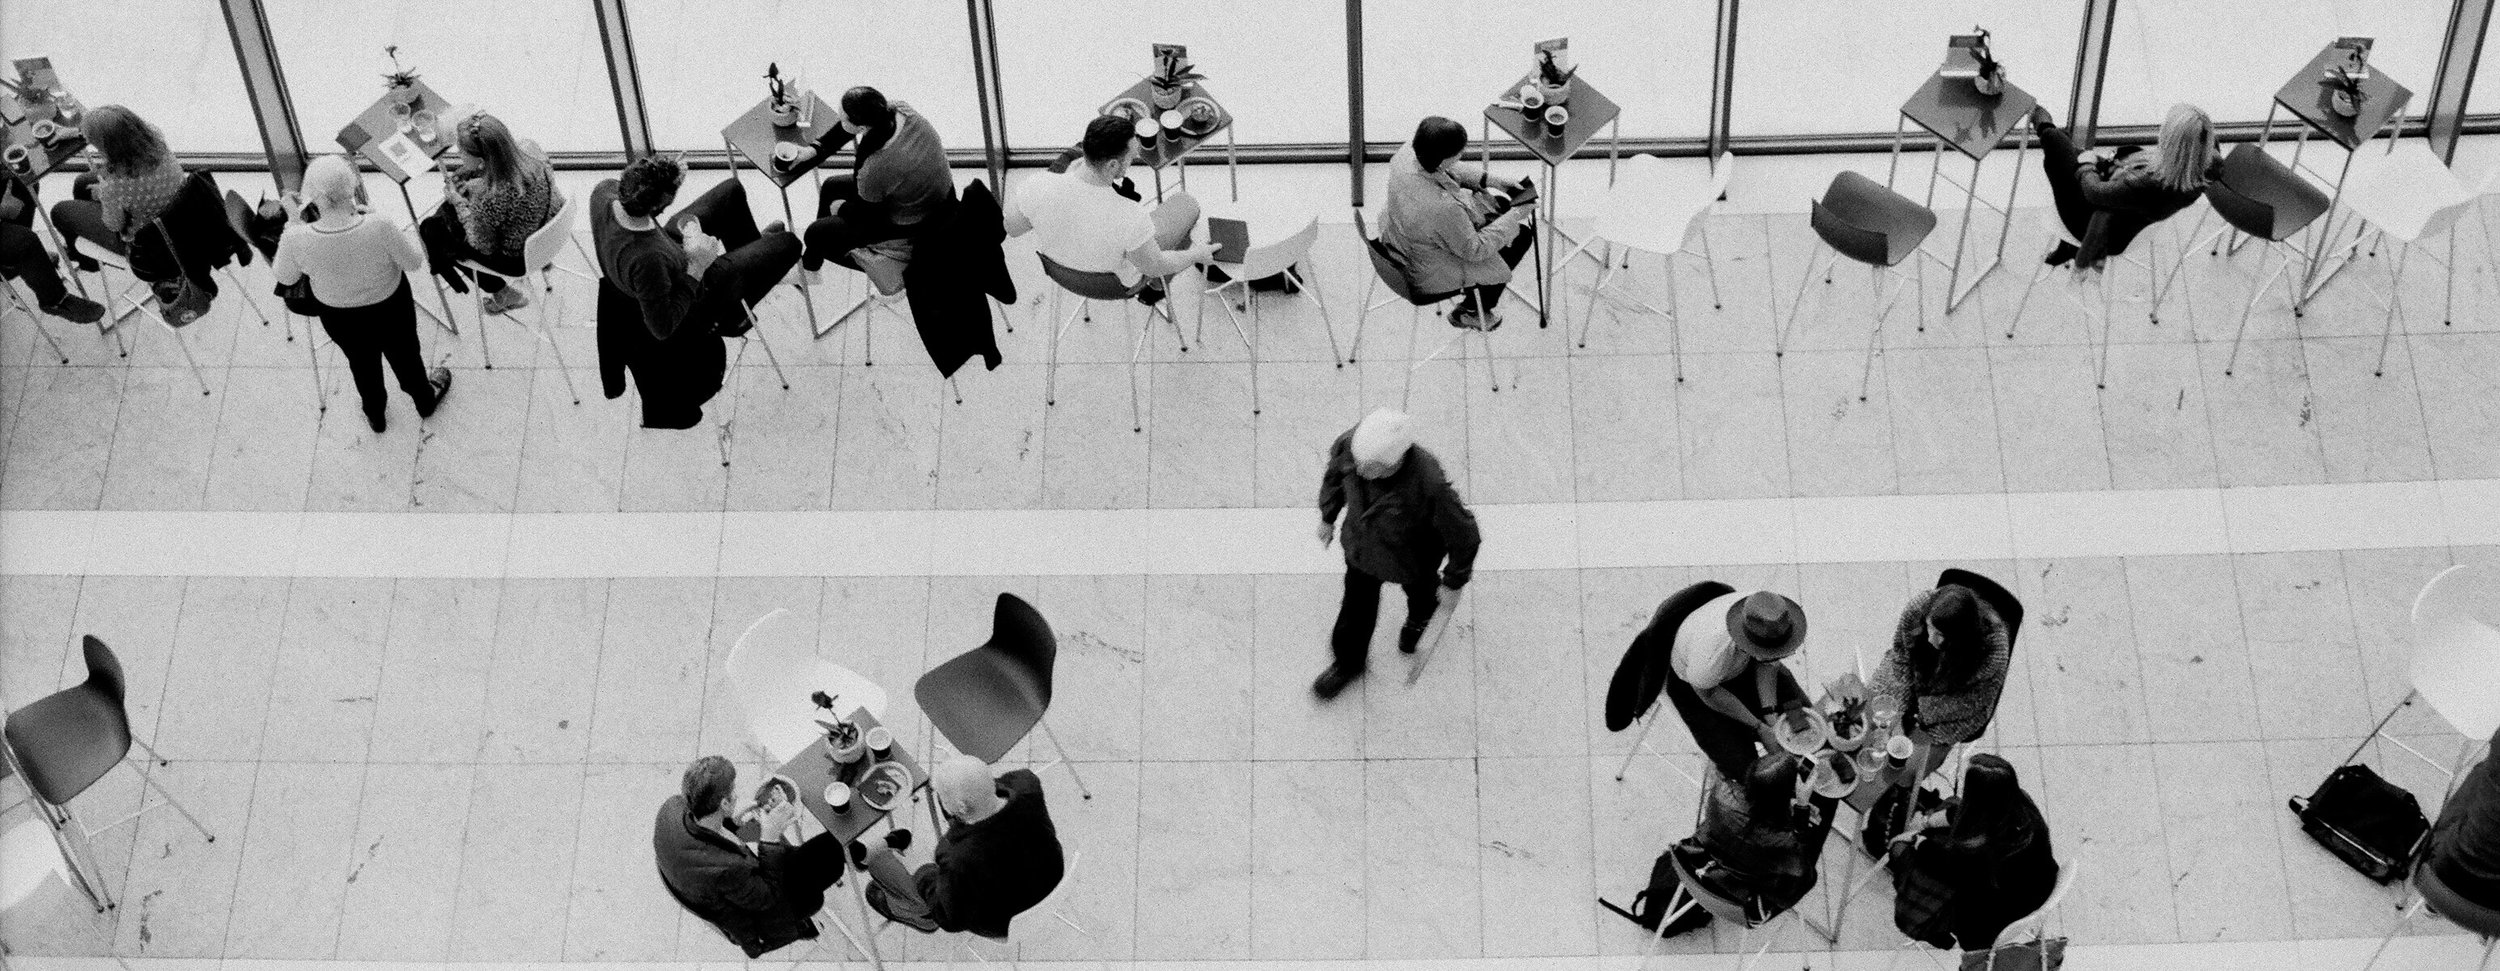 People At Nine Tables.jpg